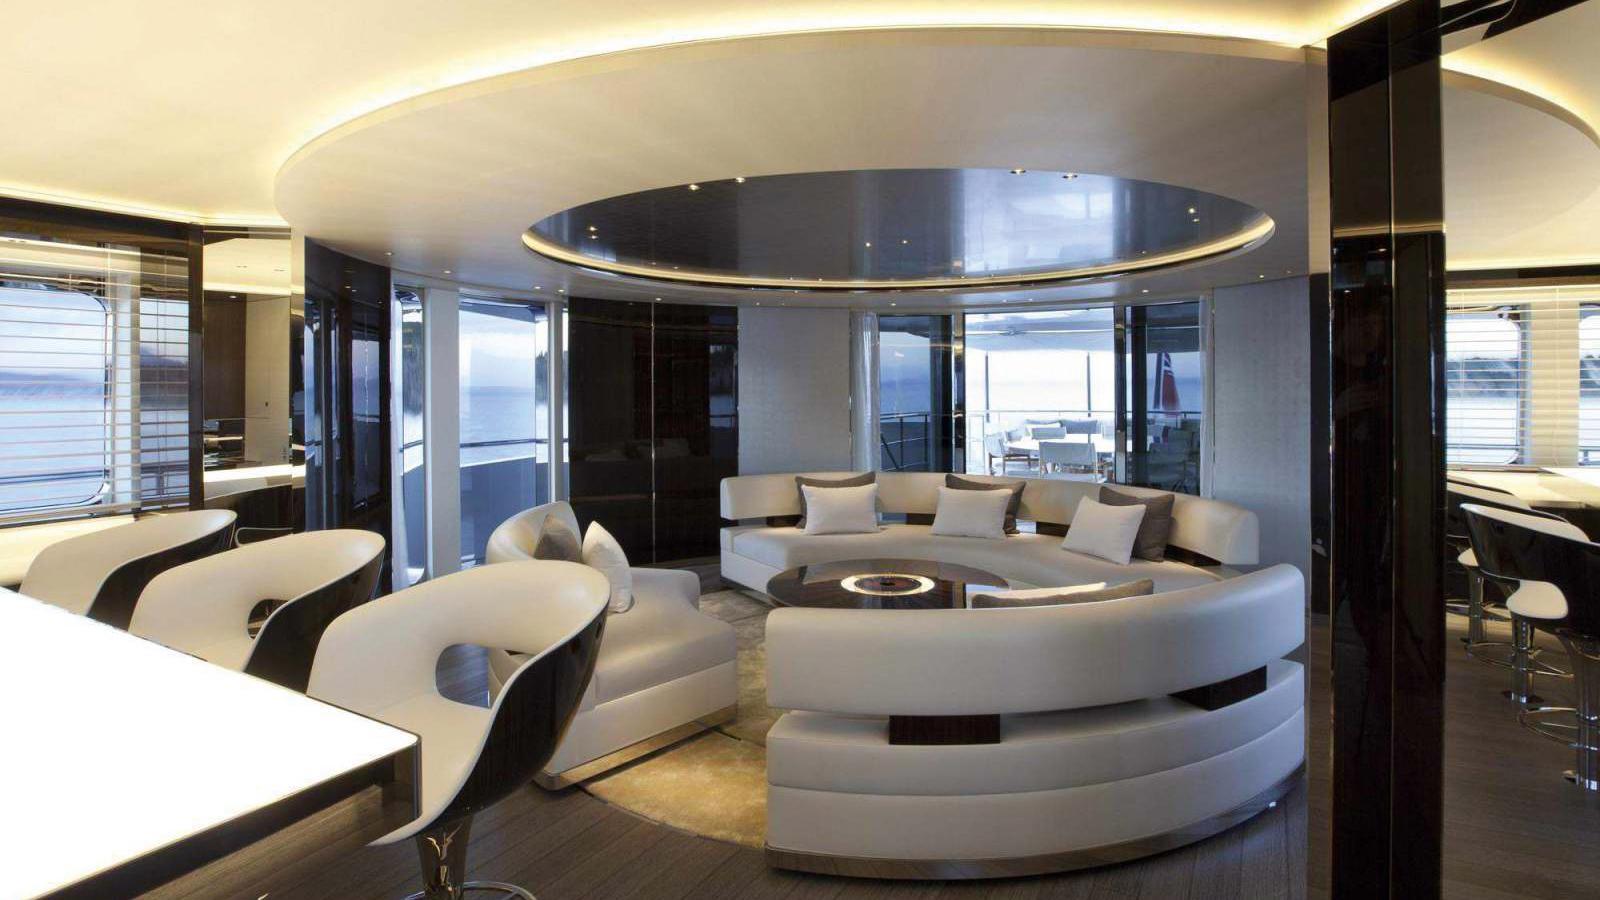 septimus-motor-yacht-heesen-2011-50m-circular-saloon